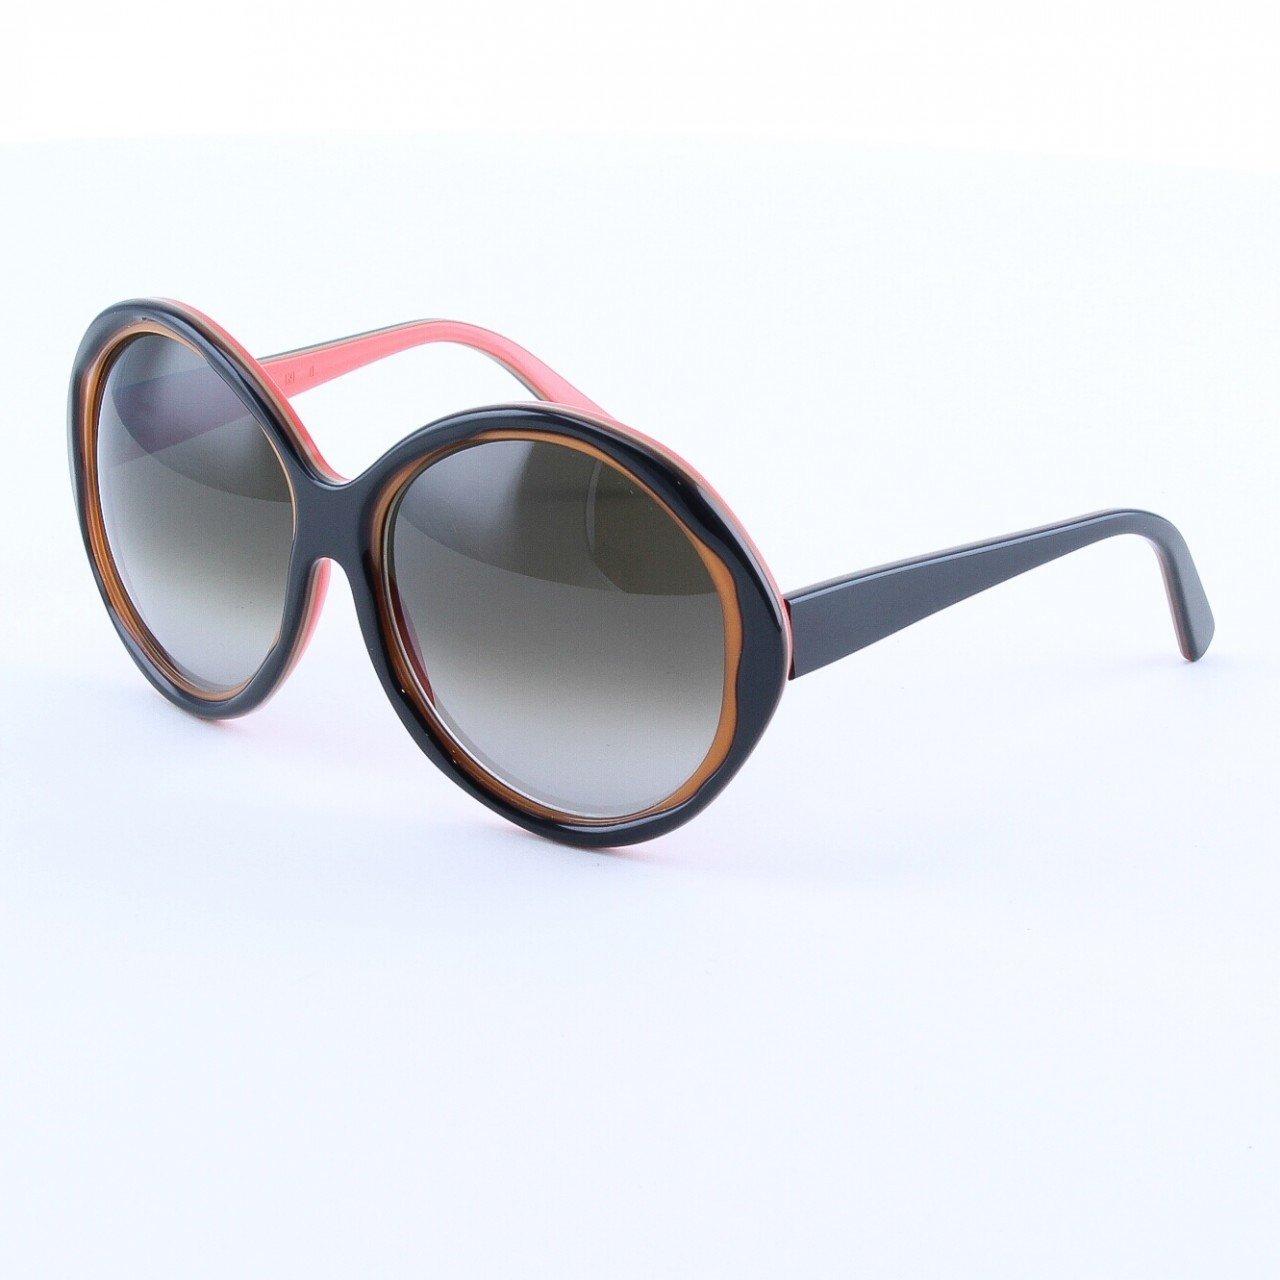 Marni MA156 Sunglasses Col. 03 Dark Chocolate Brown and Tan with Brown Lenses